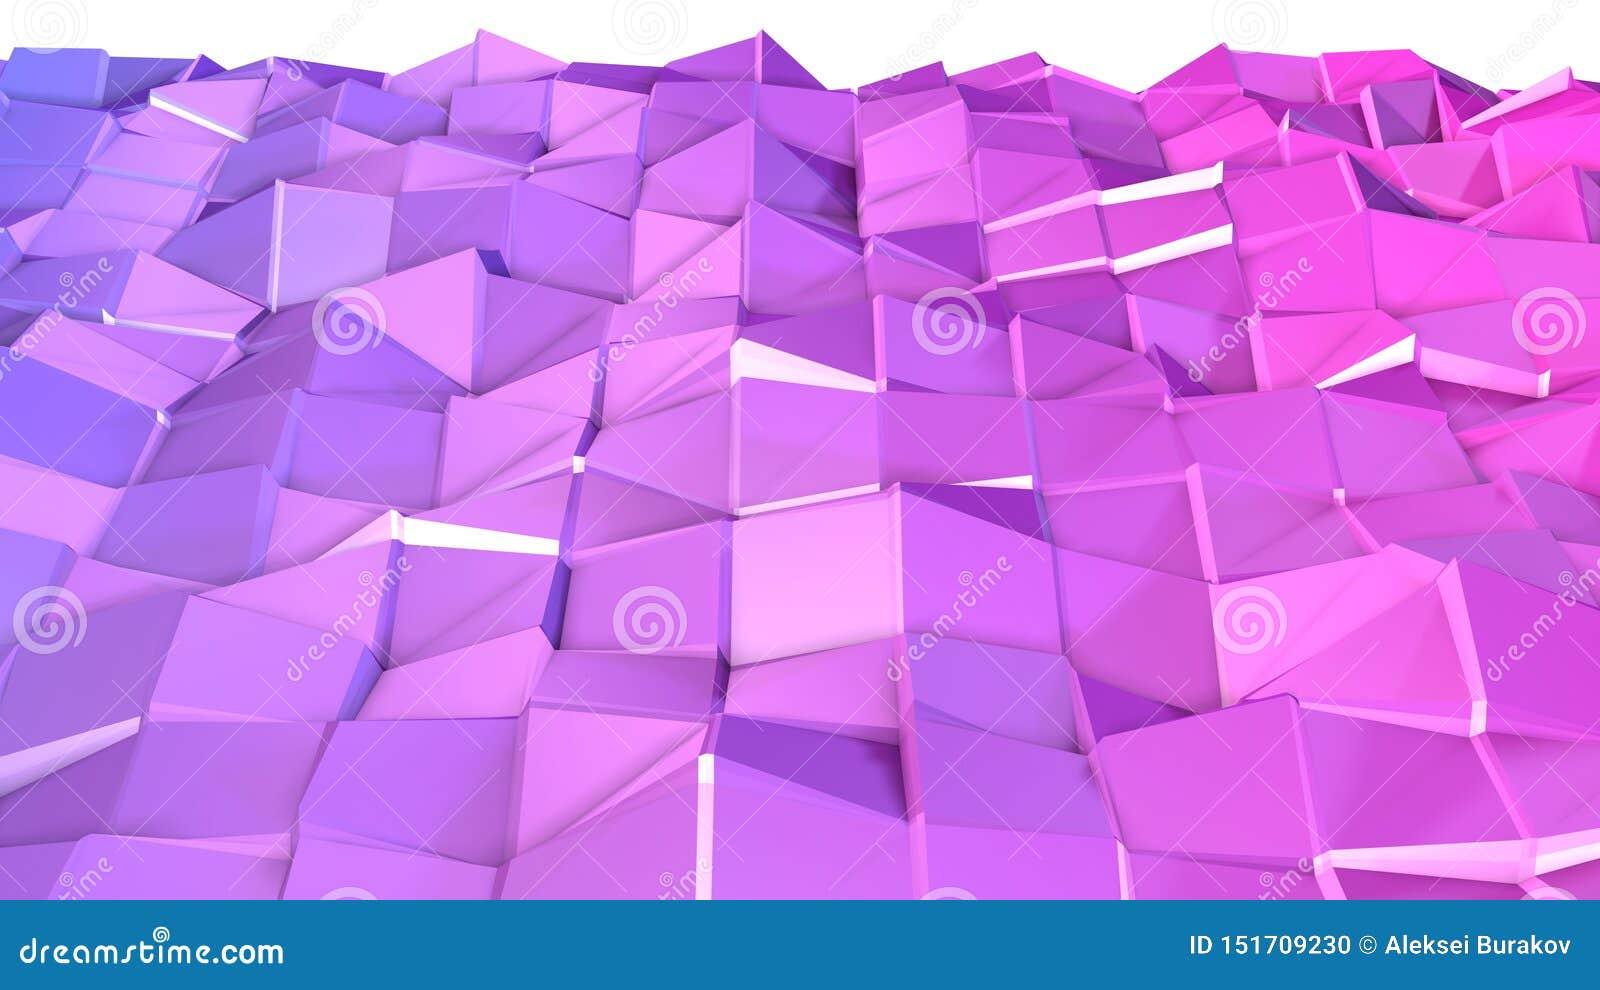 3d oppervlakte als 3d lage poly abstracte geometrische achtergrond met moderne gradiëntkleuren, rood blauw viooltje